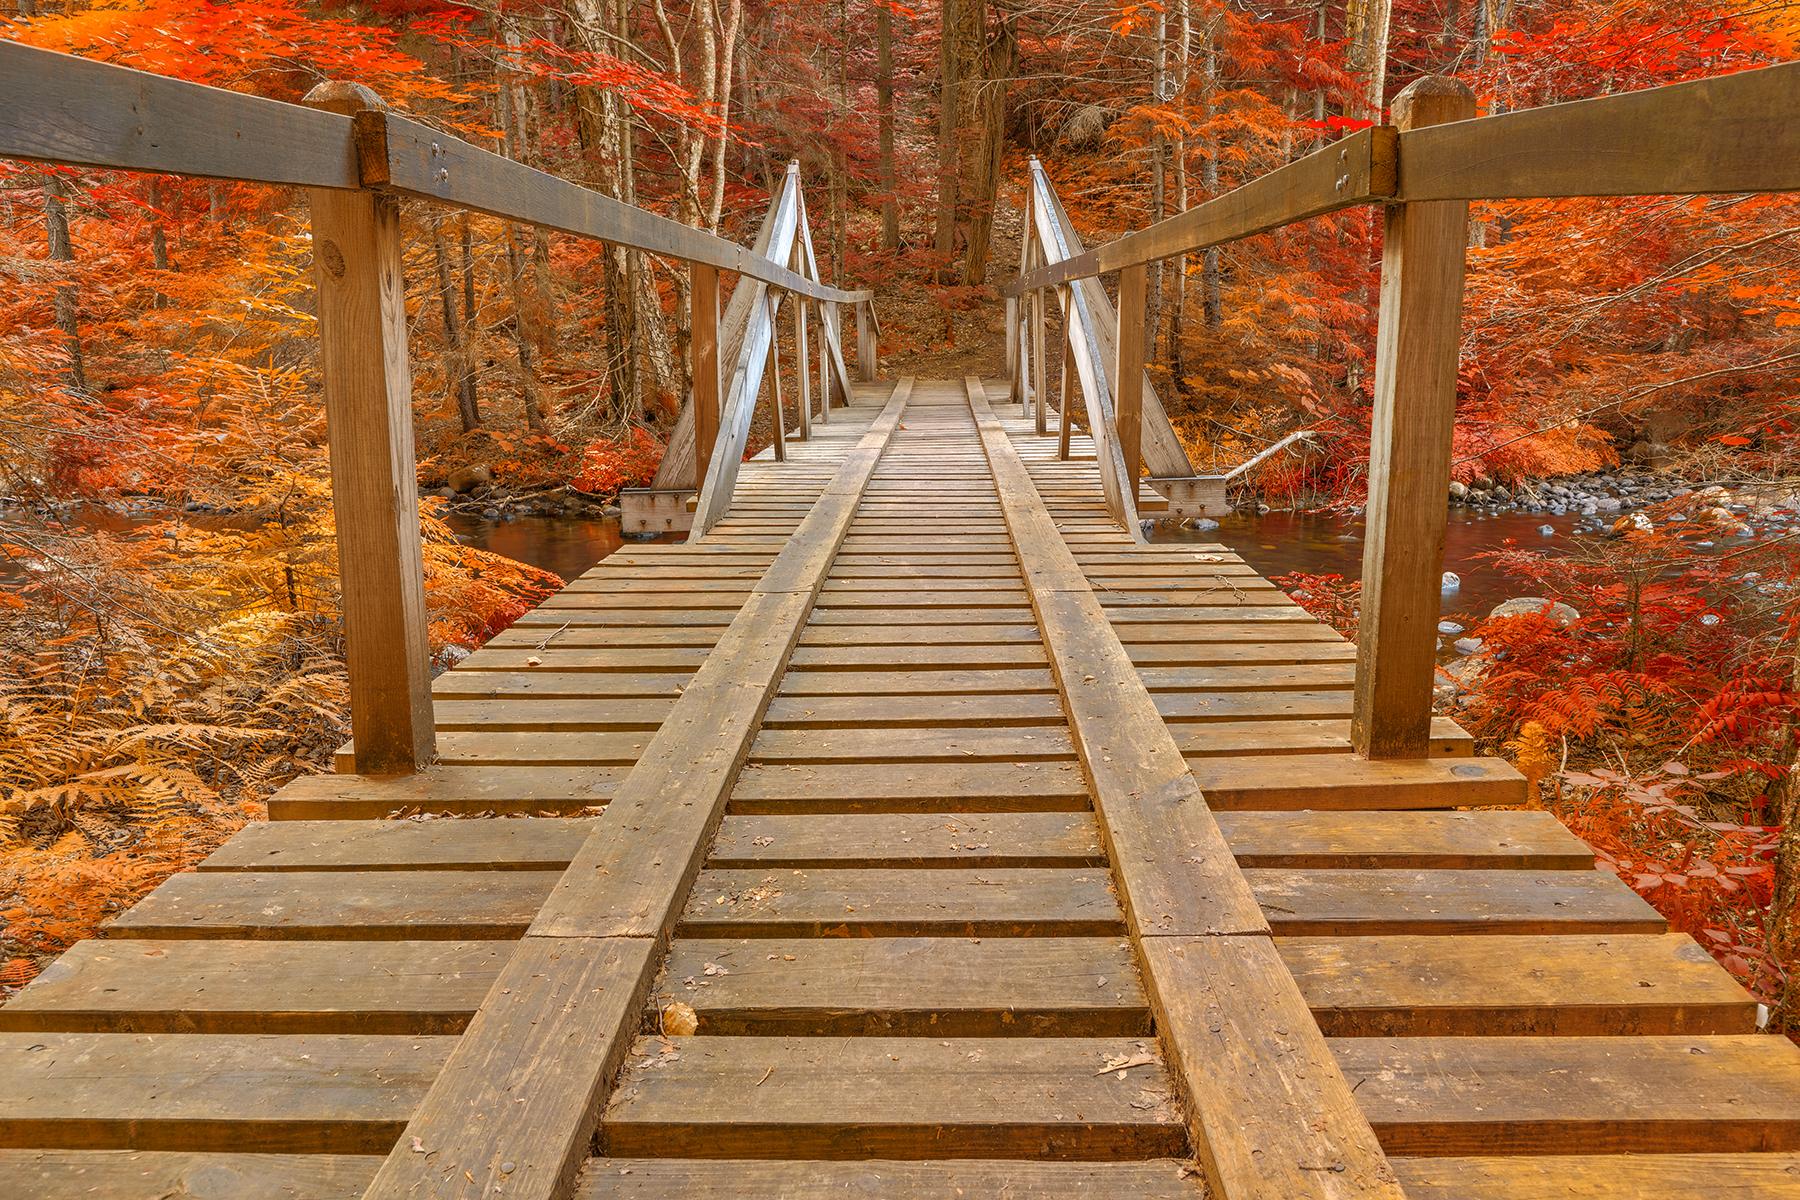 Autumn forest track bridge - hdr photo